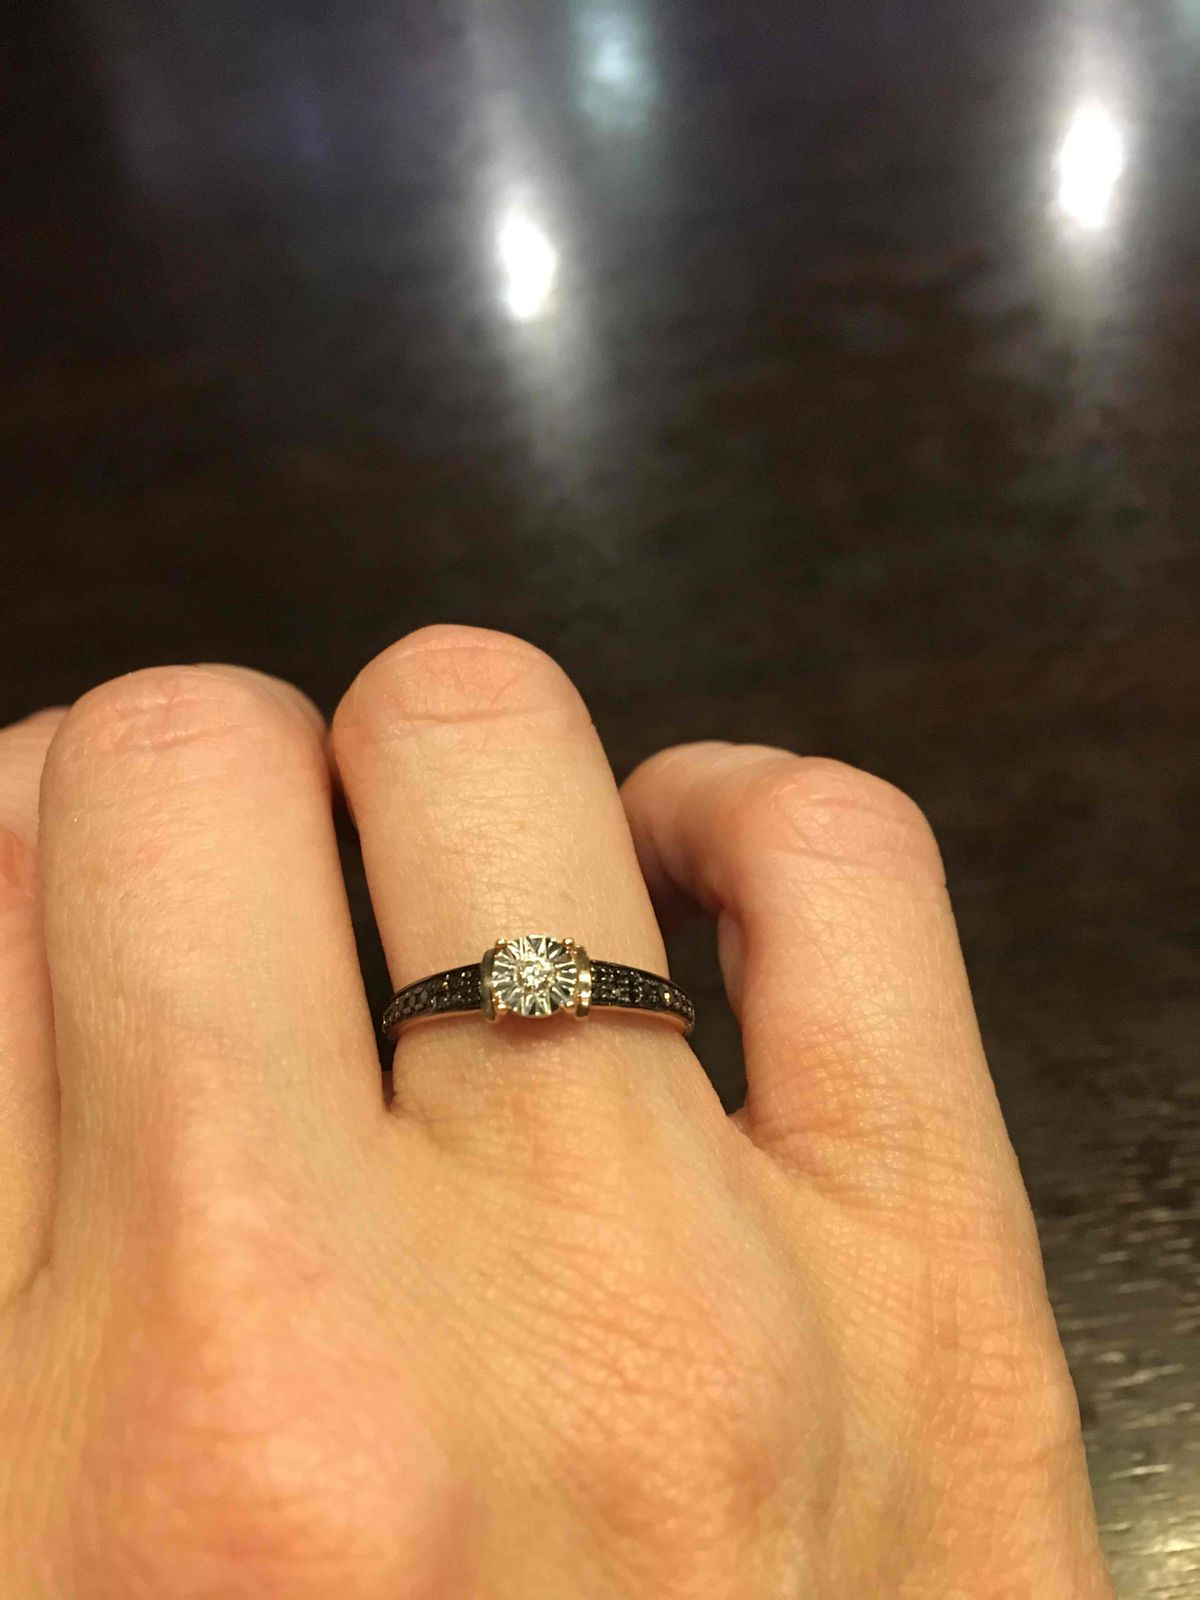 Нежное кольцо с бриллиантами